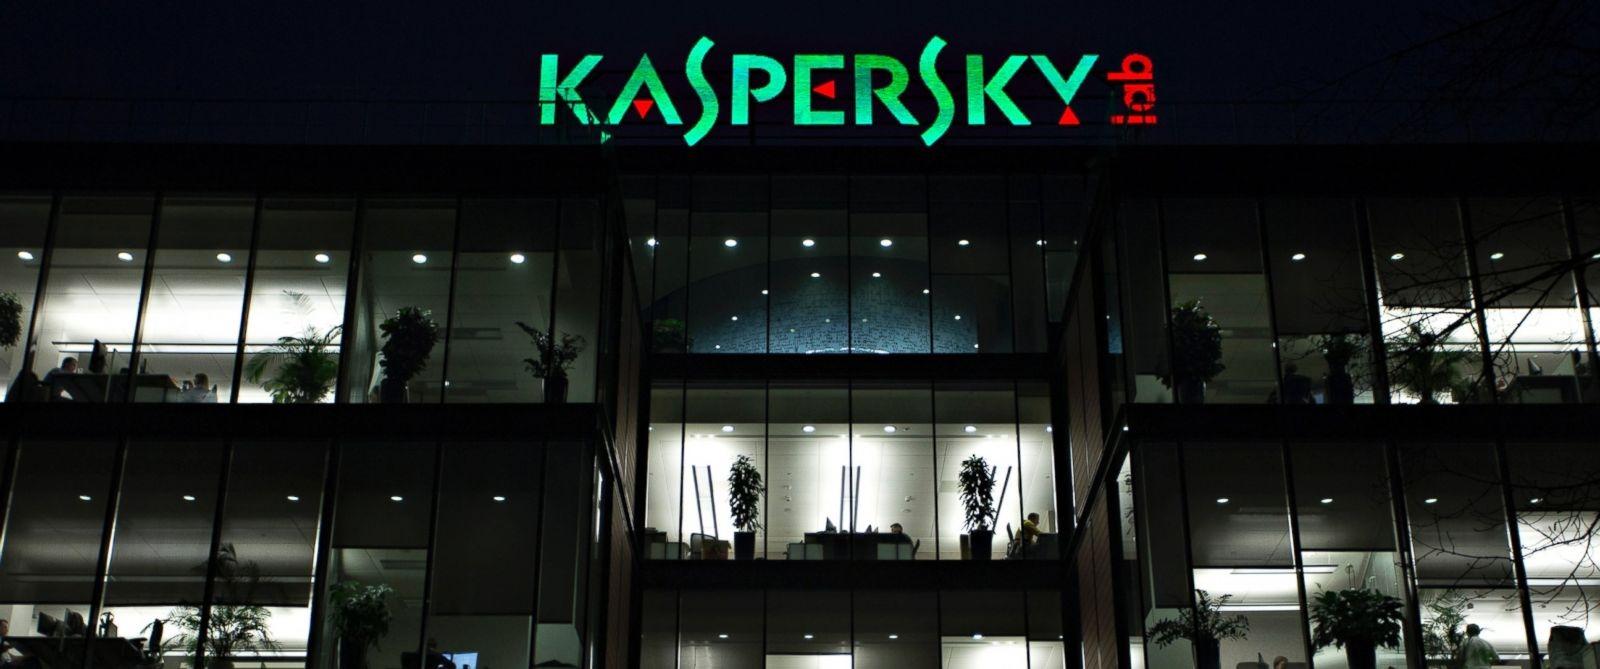 Kaspersky espionaje EEUU Rusia